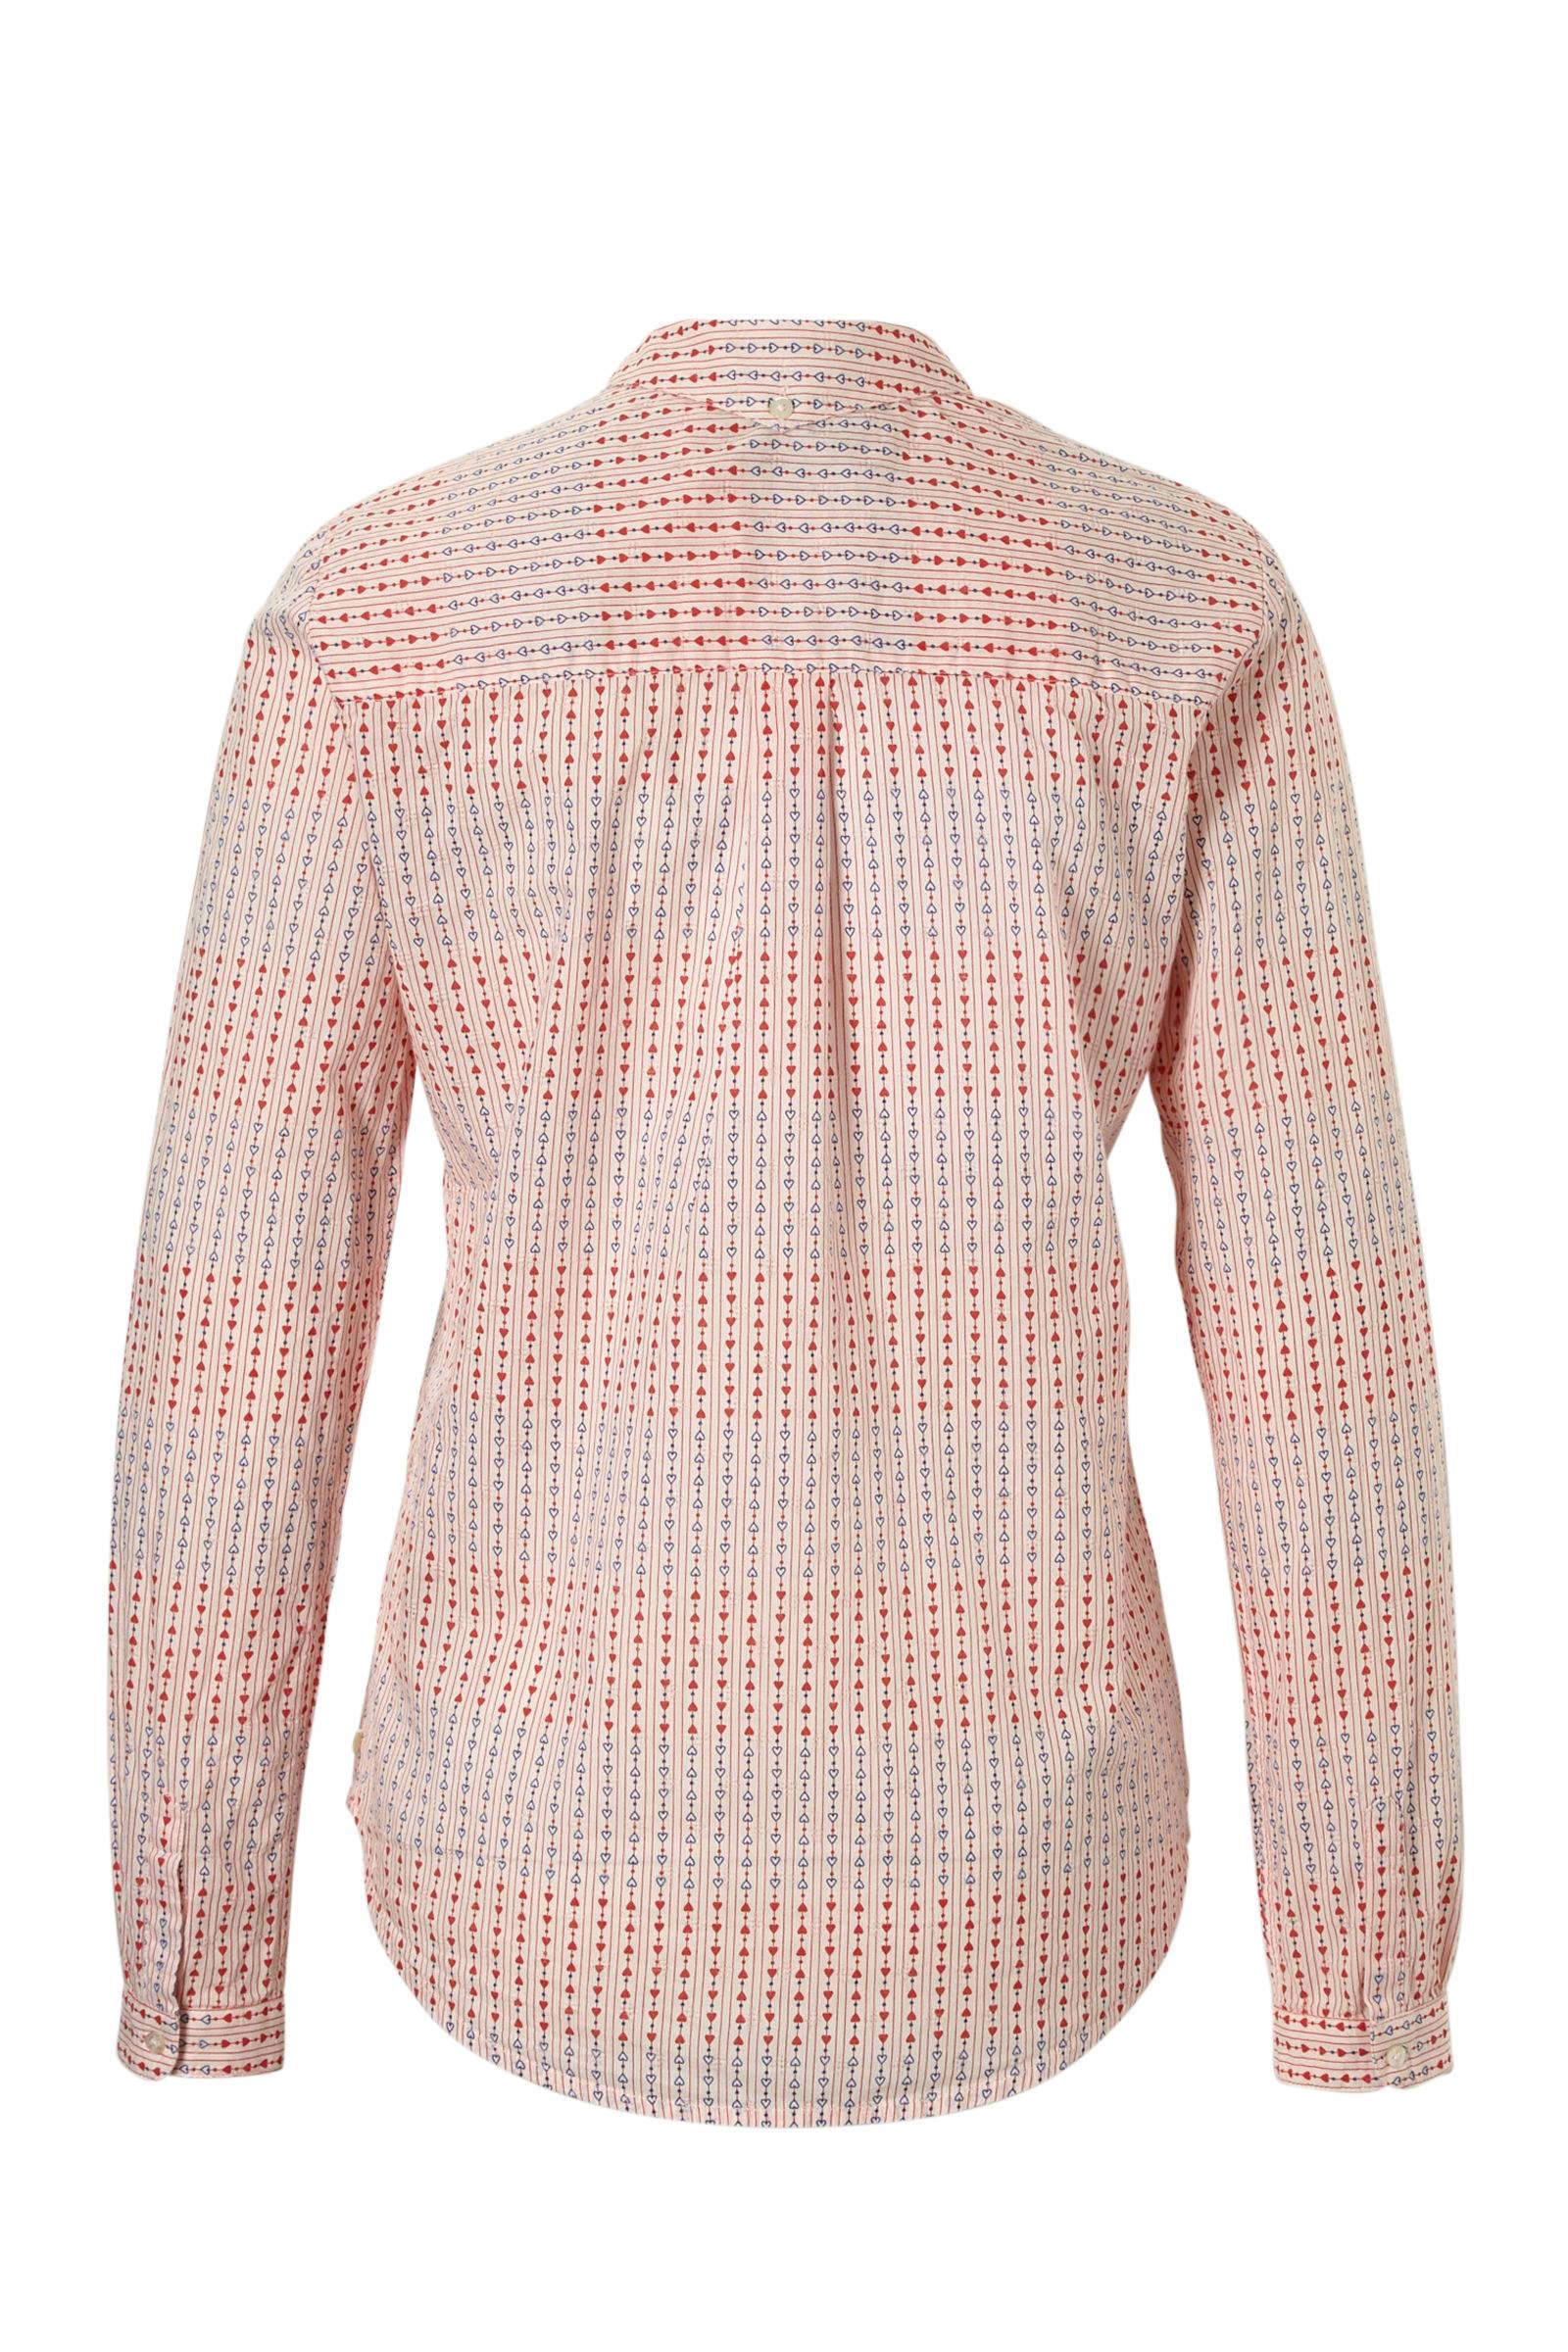 Scotch all over blouse Soda met print qIwtrqxYB